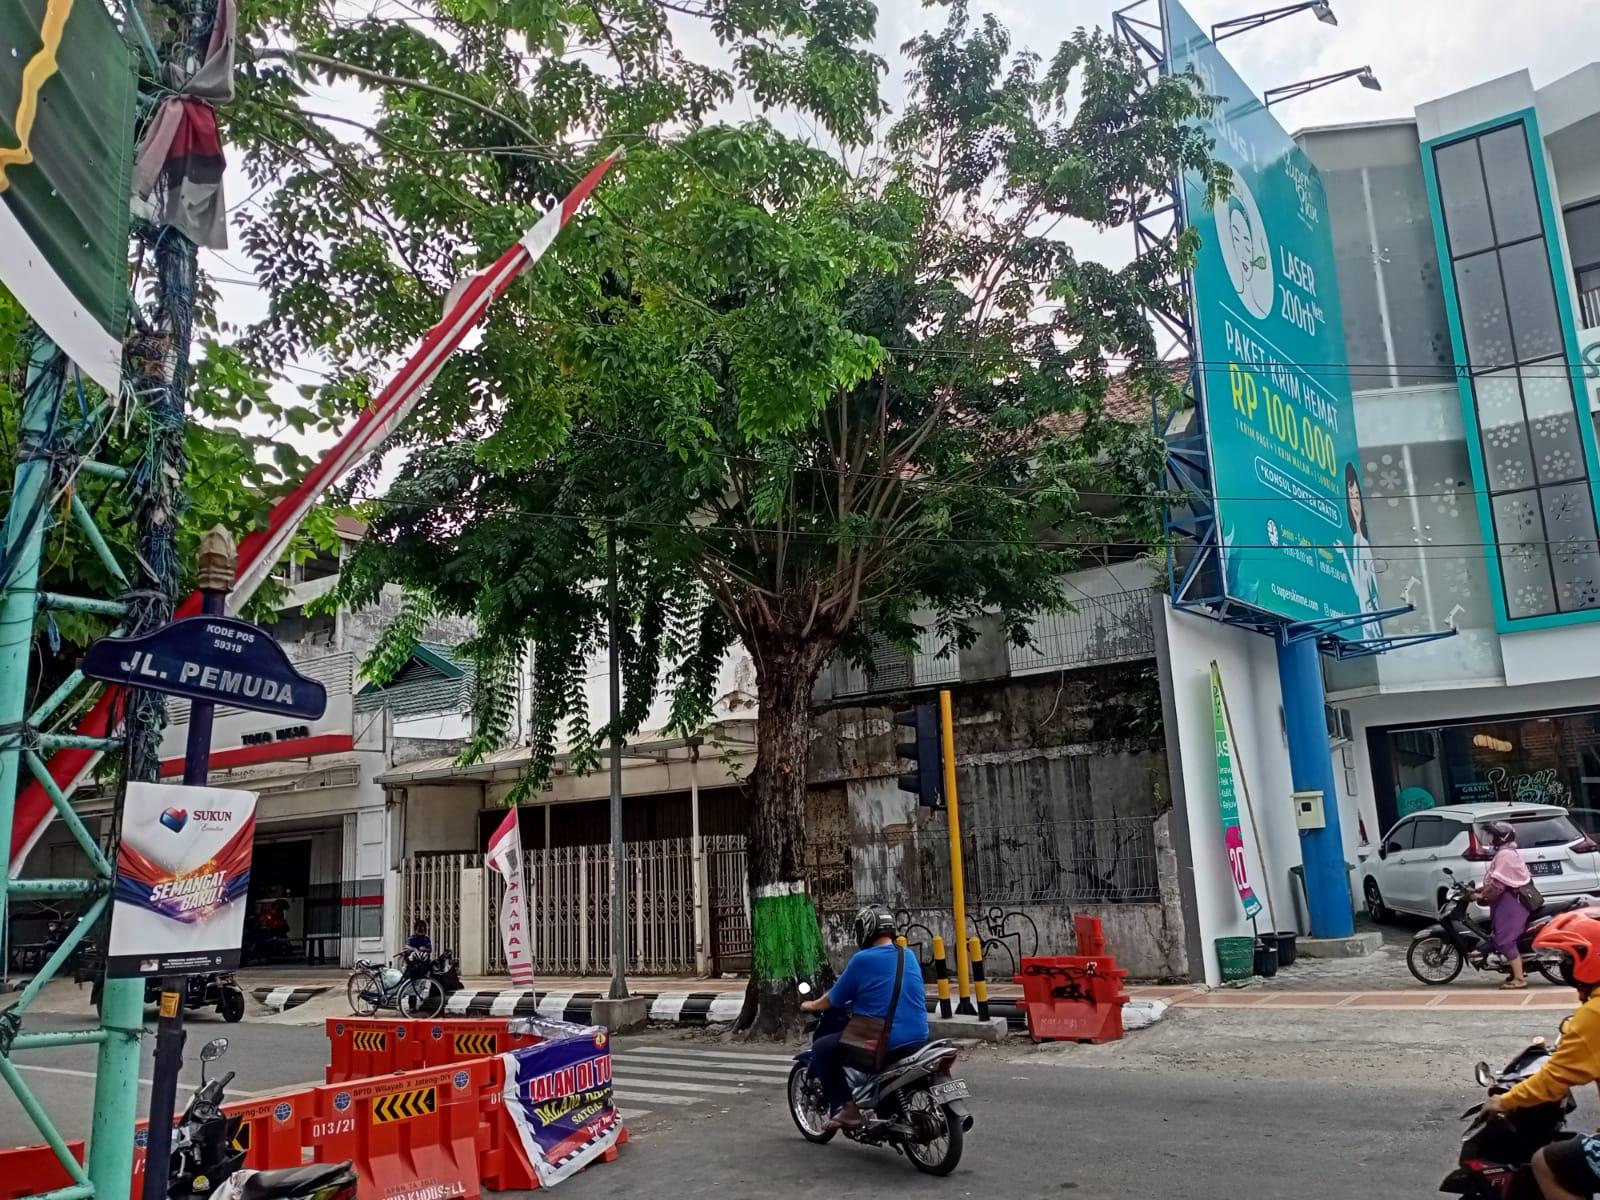 ILUTRASI- Penyekatan jalan dibuka di Kabupaten Kudus. Saat ini Kabupaten Kudus menerapkan PPKM level 2. FOTO: Alifia/Lingkar.co